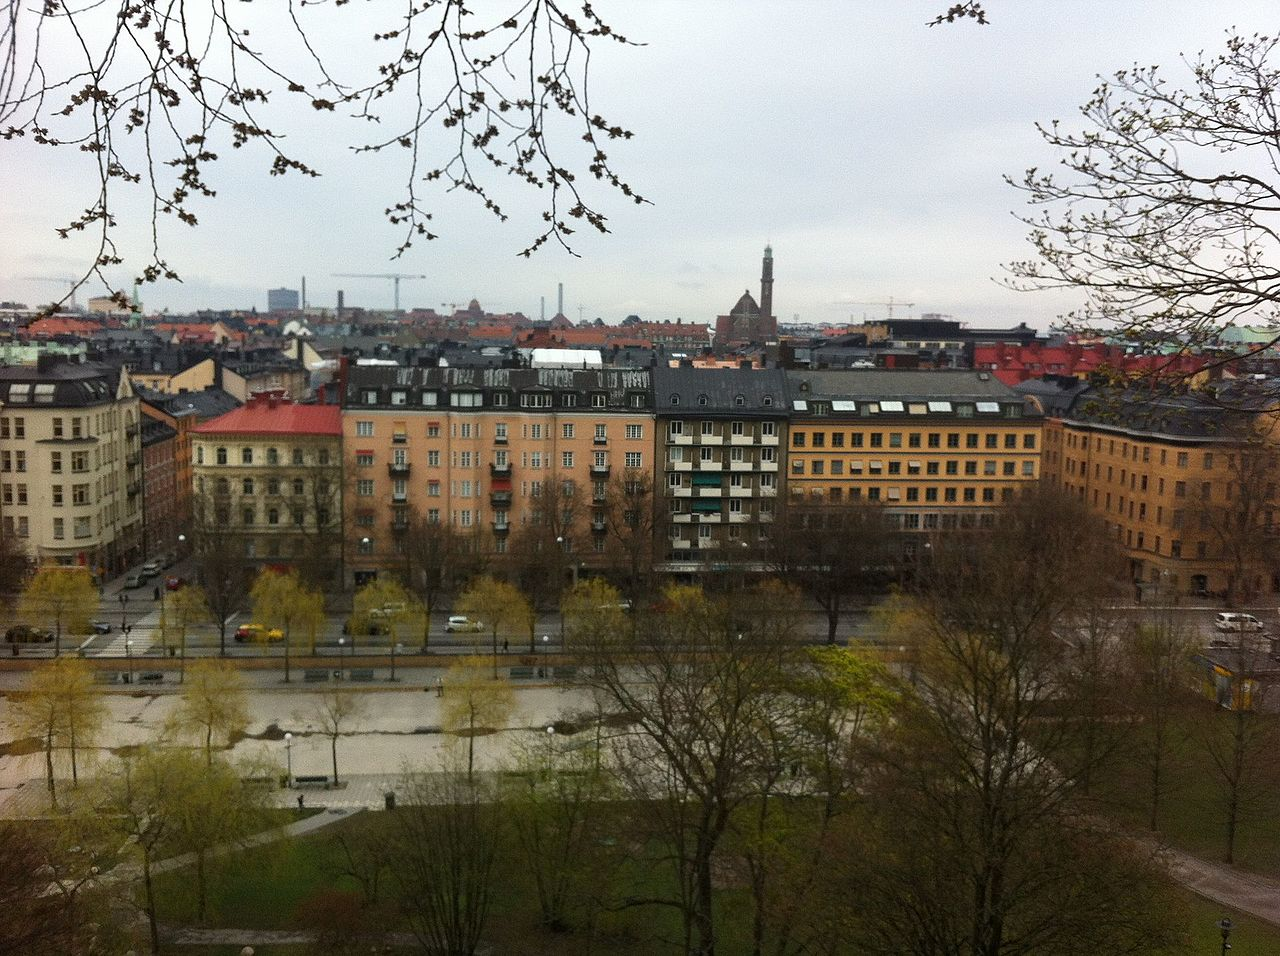 Dating site massage vasastan stockholm analstav gratis lesbisk